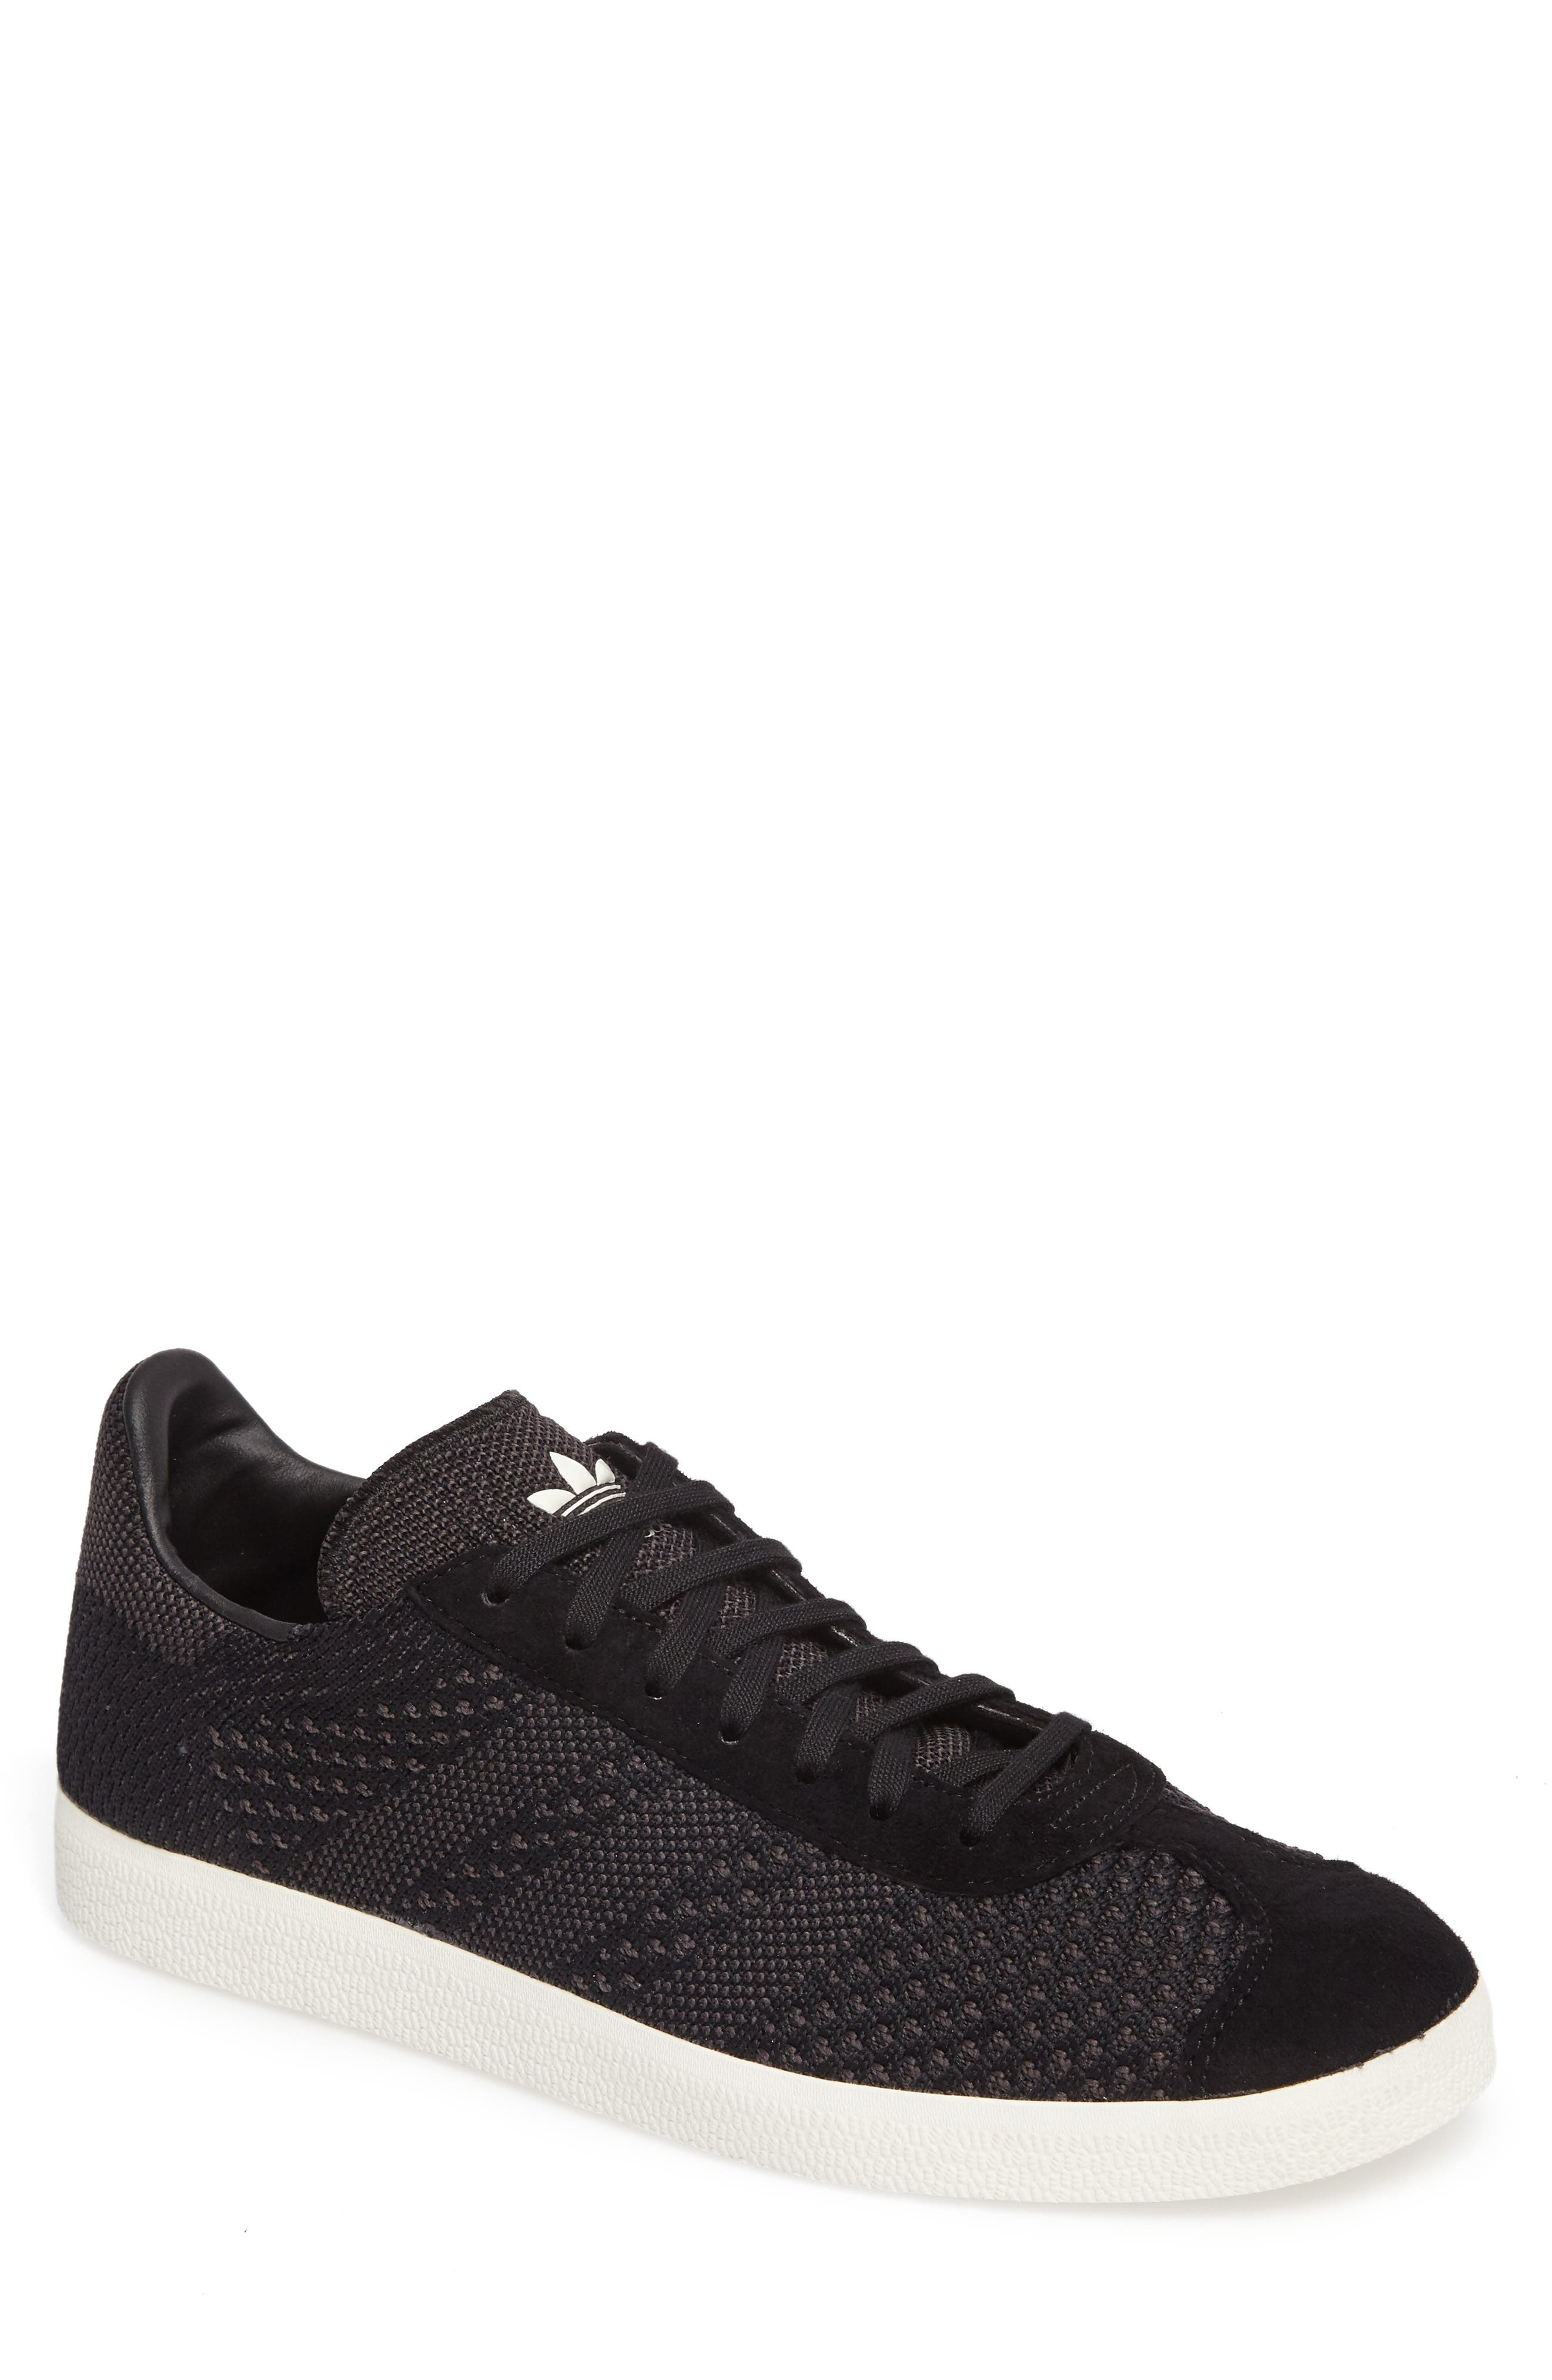 Gazelle Primeknit Sneaker,                         Main,                         color, Core Black/ Off White